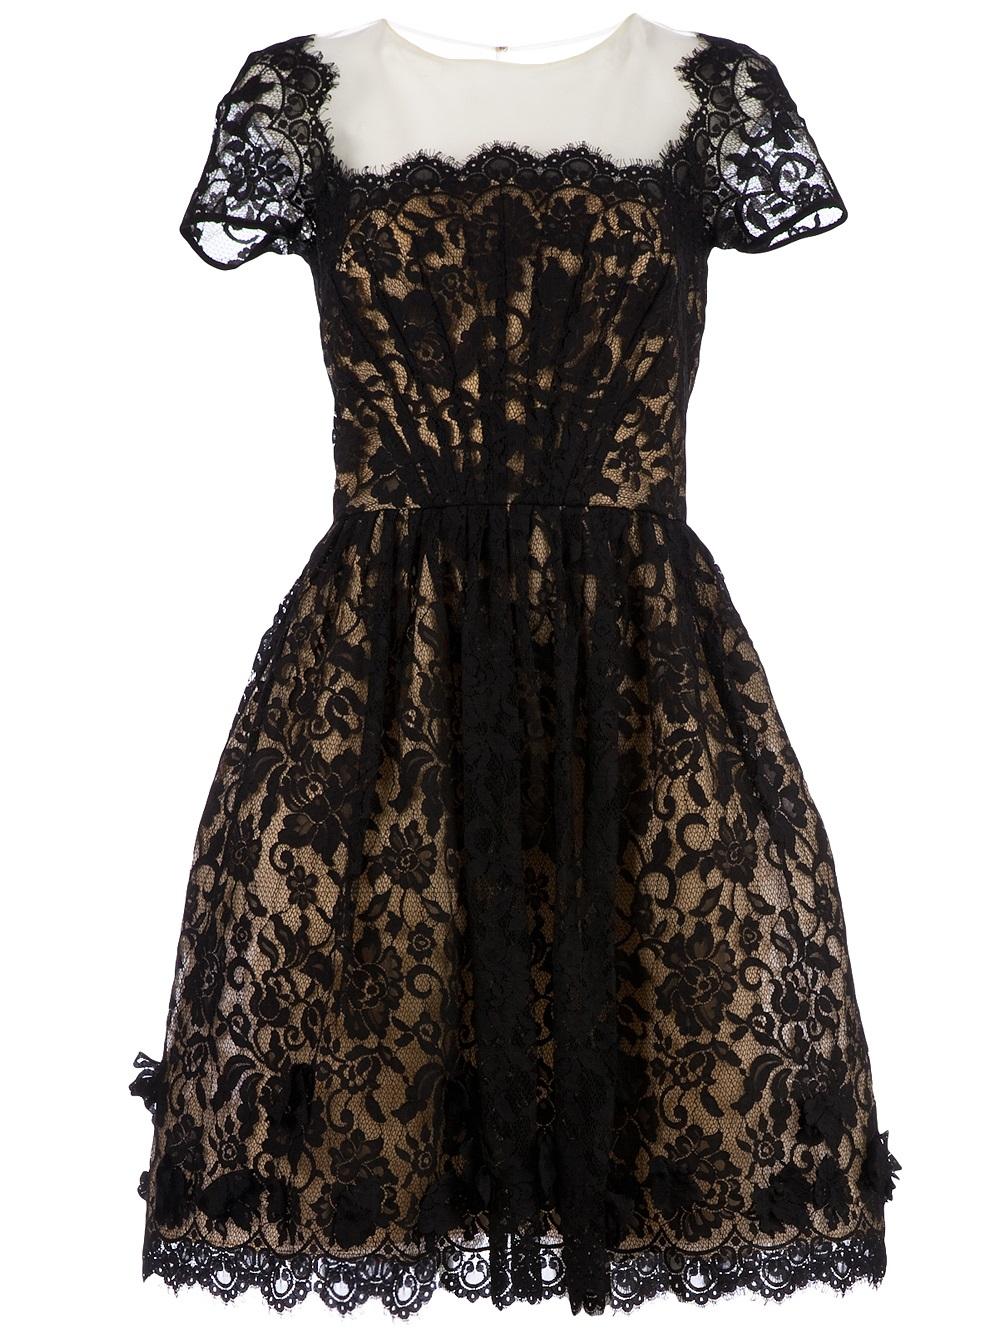 lyst oscar de la renta organza lace cocktail dress in black. Black Bedroom Furniture Sets. Home Design Ideas